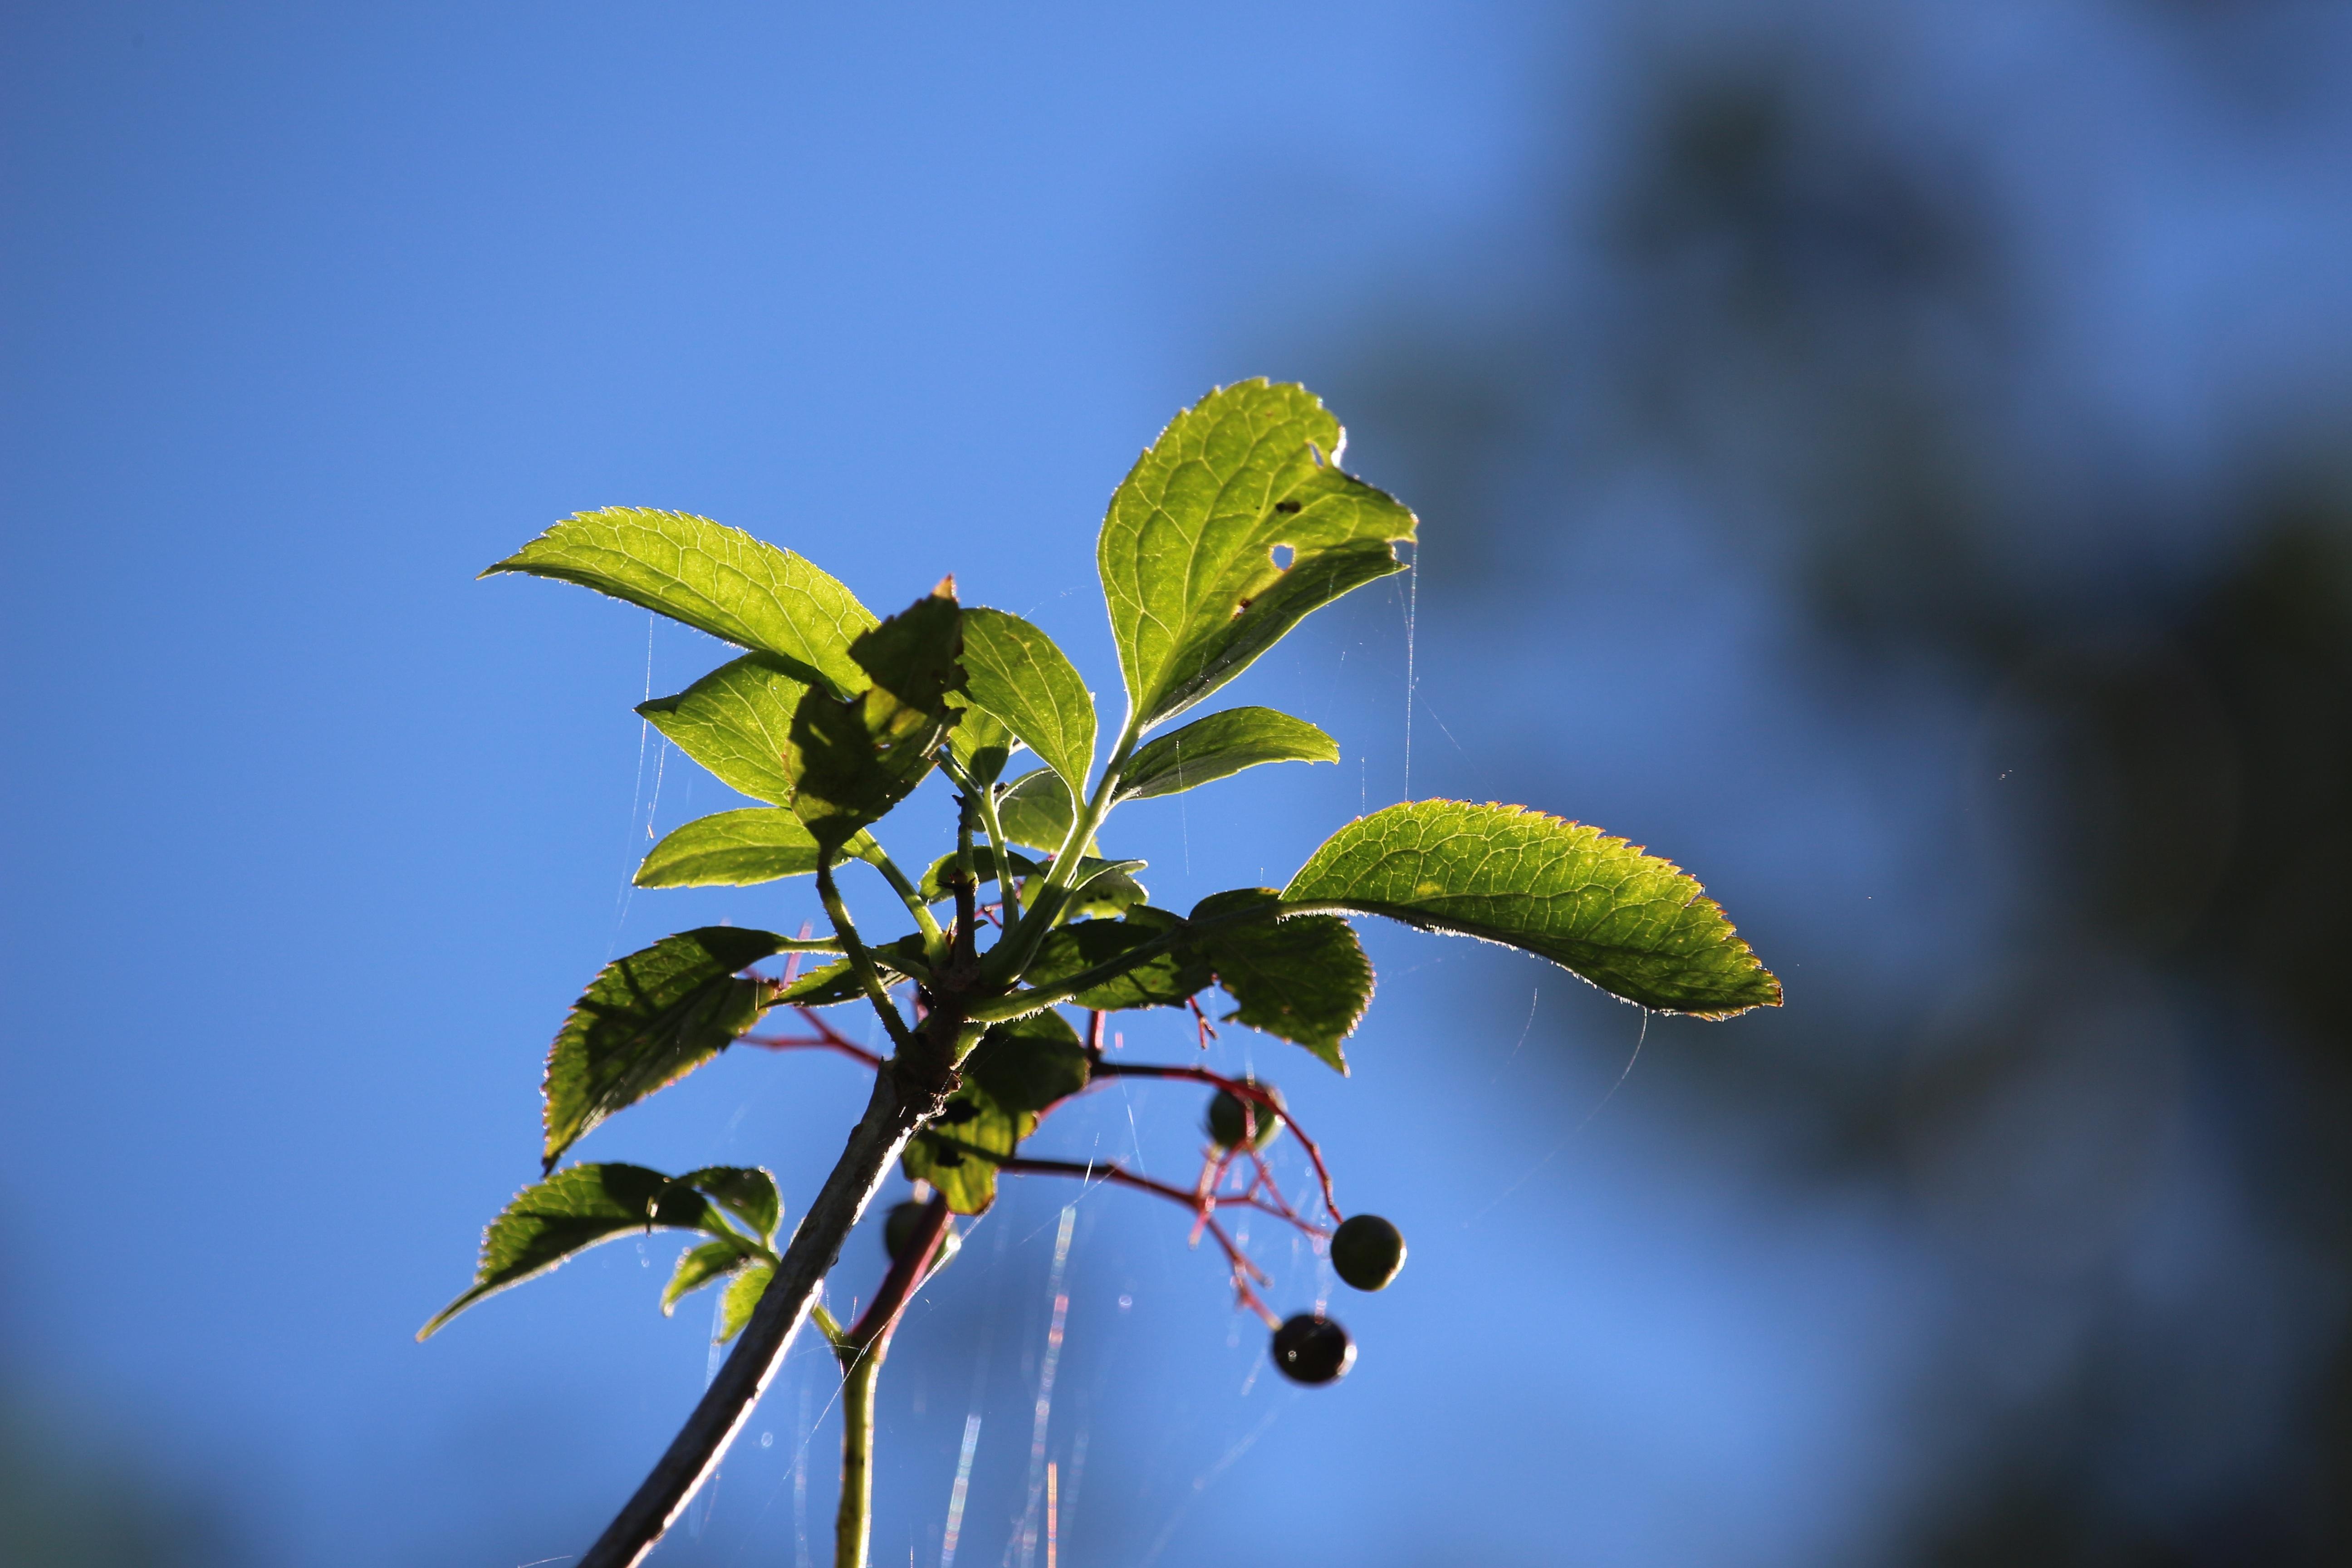 Spätsommer  Kostenlose foto : Baum, Natur, Ast, blühen, Himmel, Fotografie ...